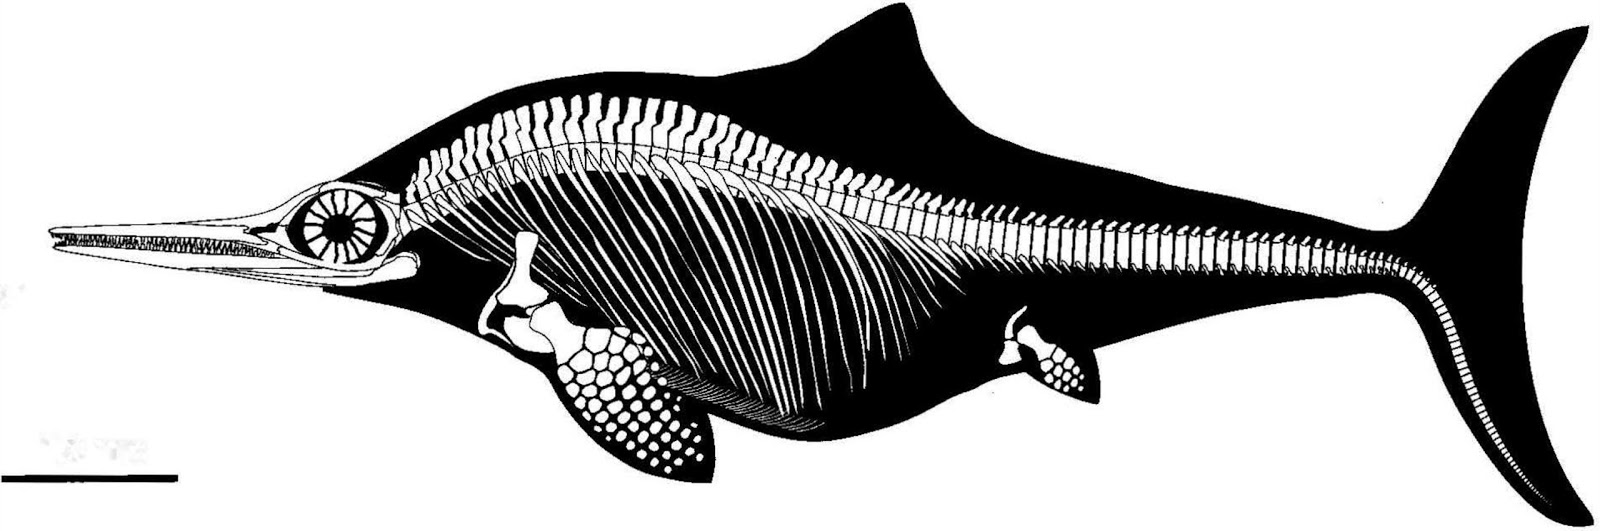 İktiyozor fosili